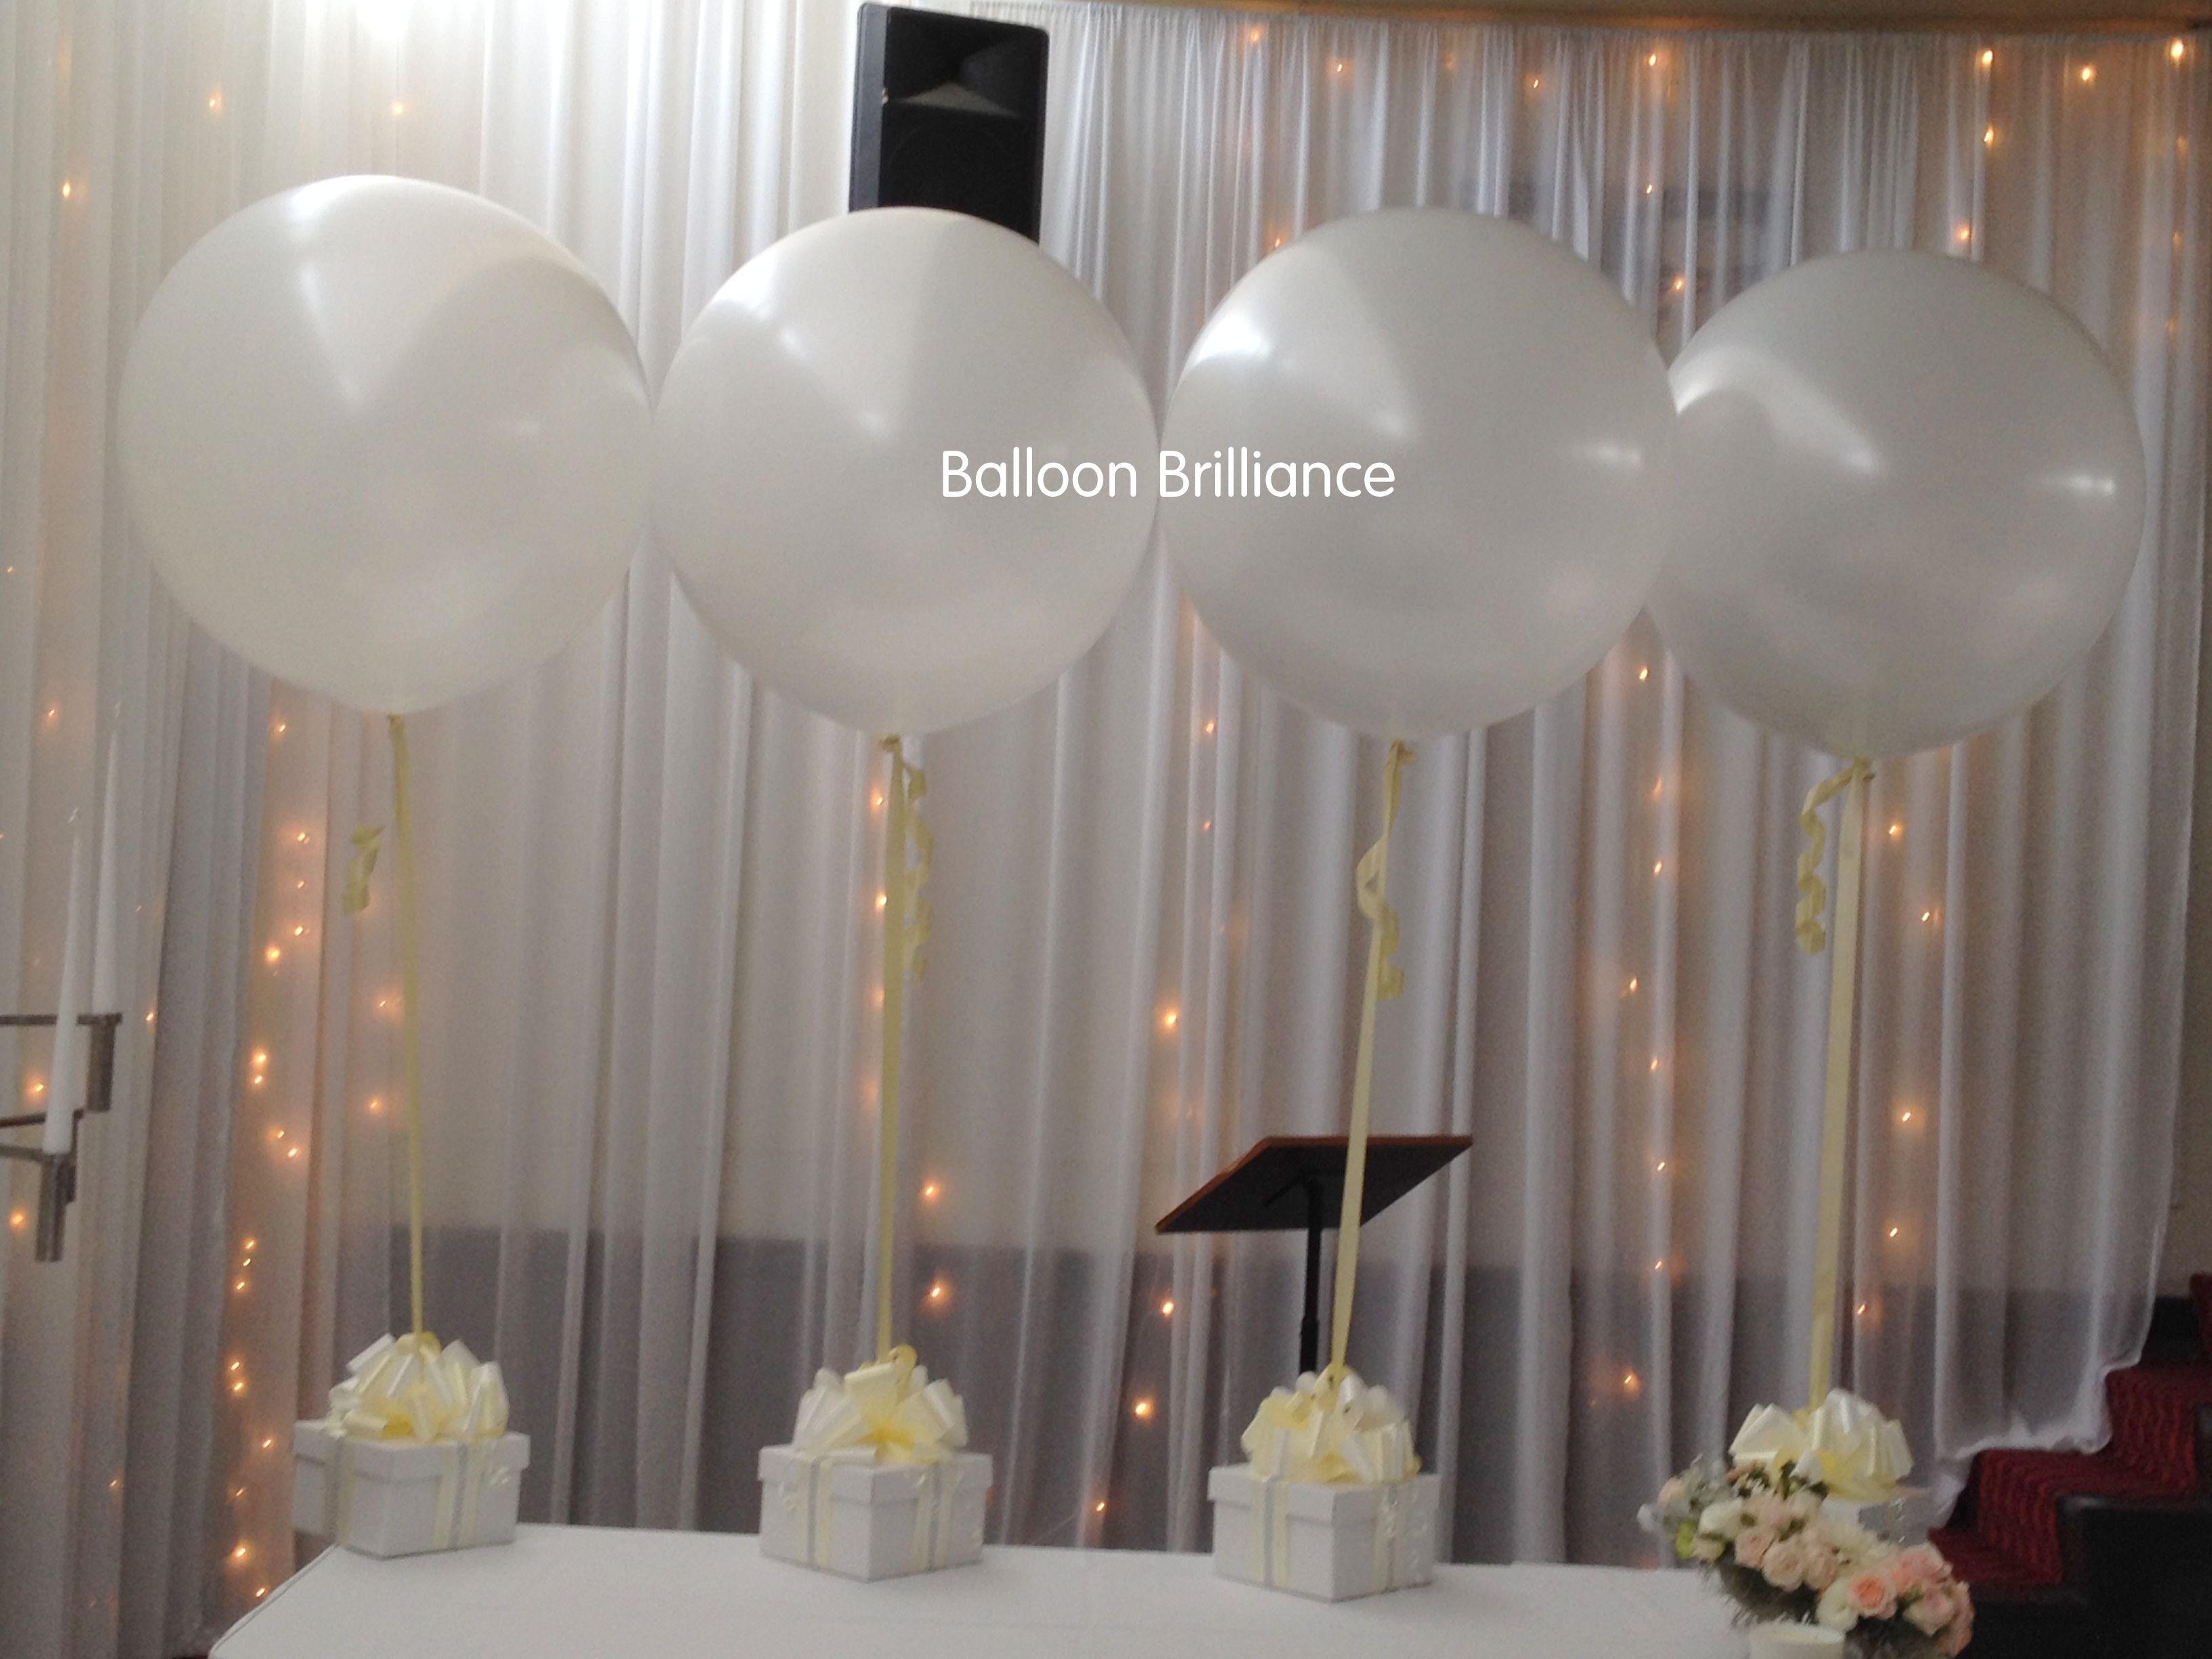 3foot Giant Jumbo Balloons Gifttable Lollybuffet Bows